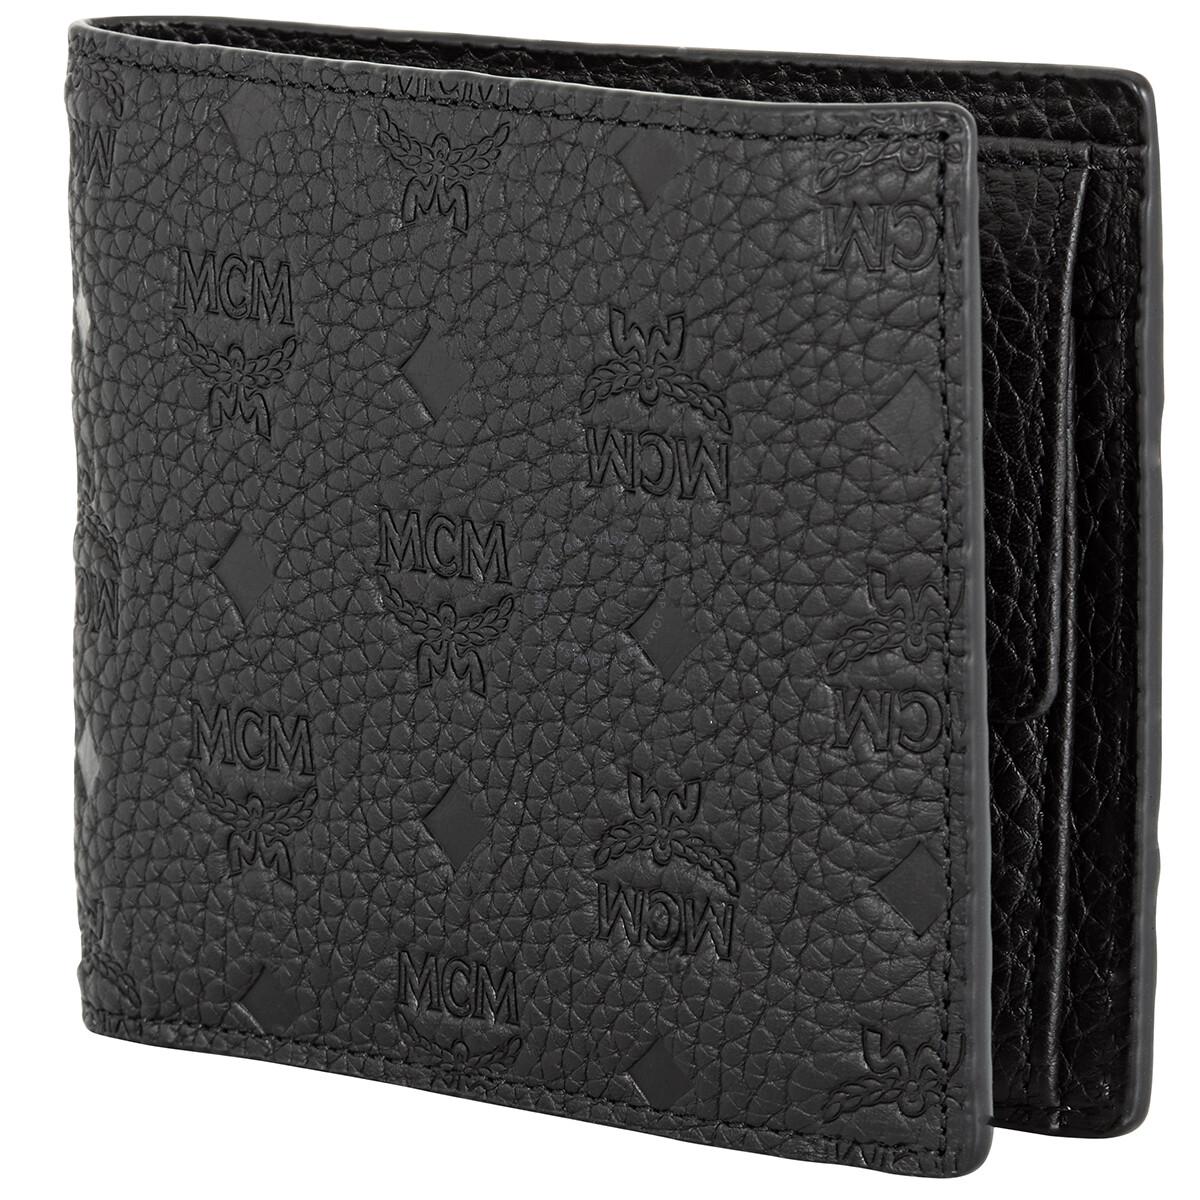 Mcm Men's Monogram Leather Bifold Wallet MXS9ABT29BK ...